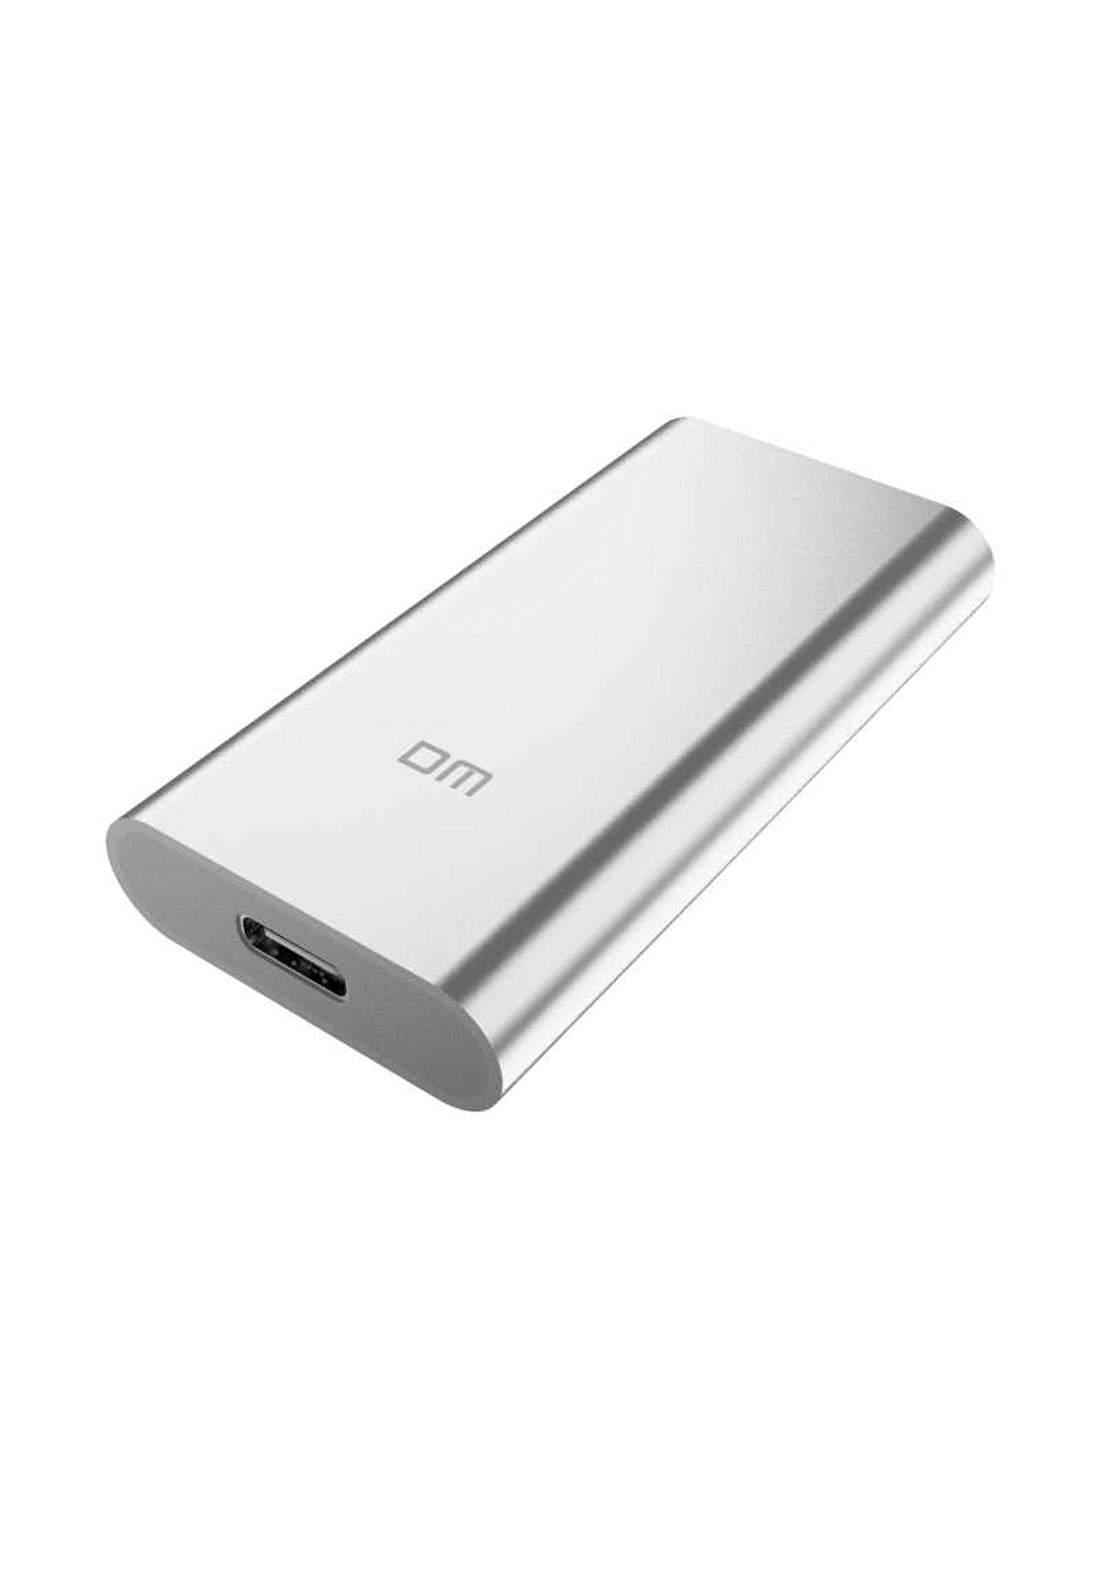 DM FS300 256 GB External Hard Disk- Gray هارد خارجي